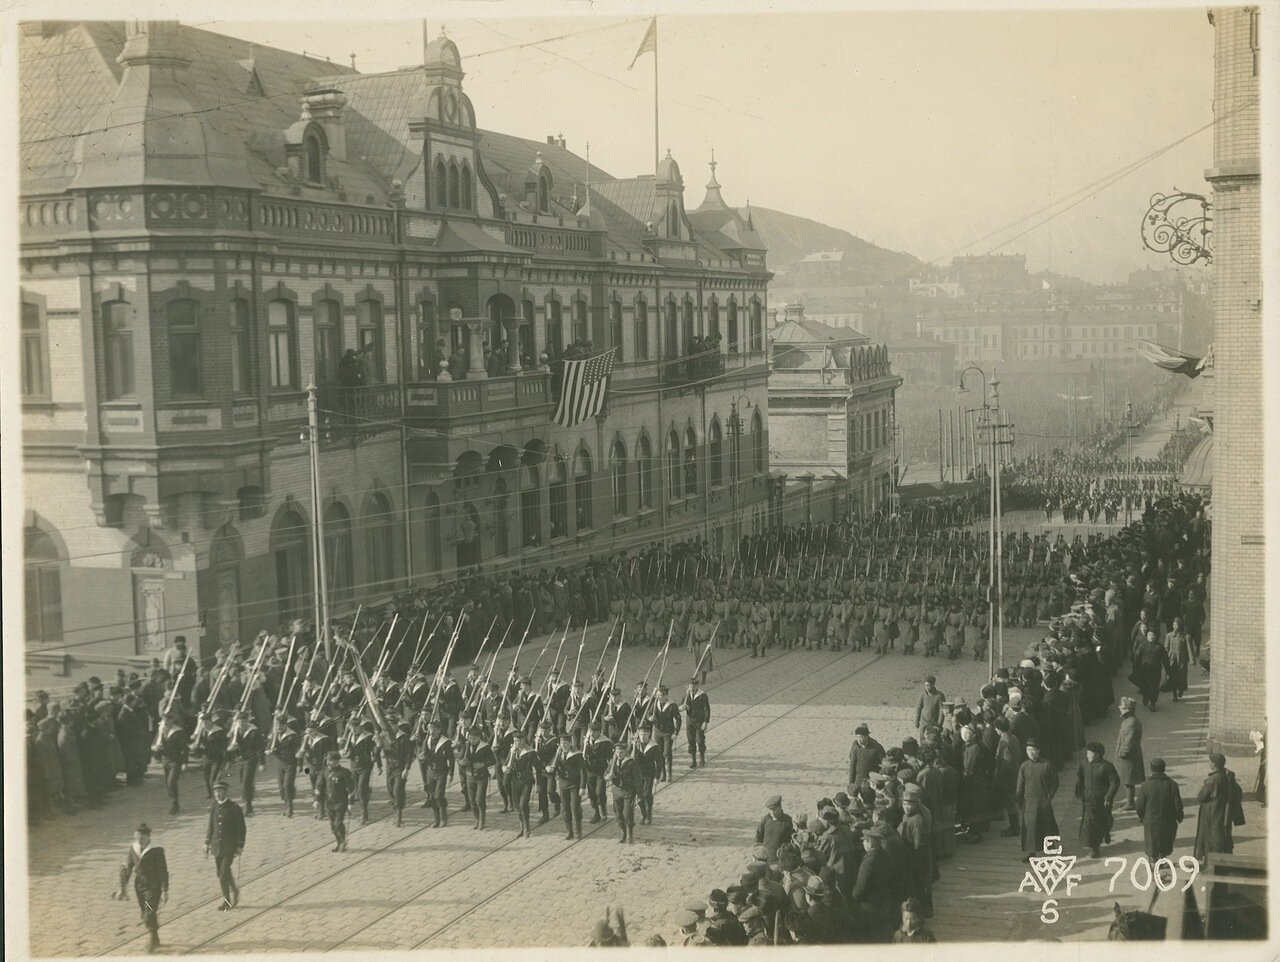 23. 1918. Моряки броненосца «Микаса», солдаты 12-ой дивизии. 15 ноября